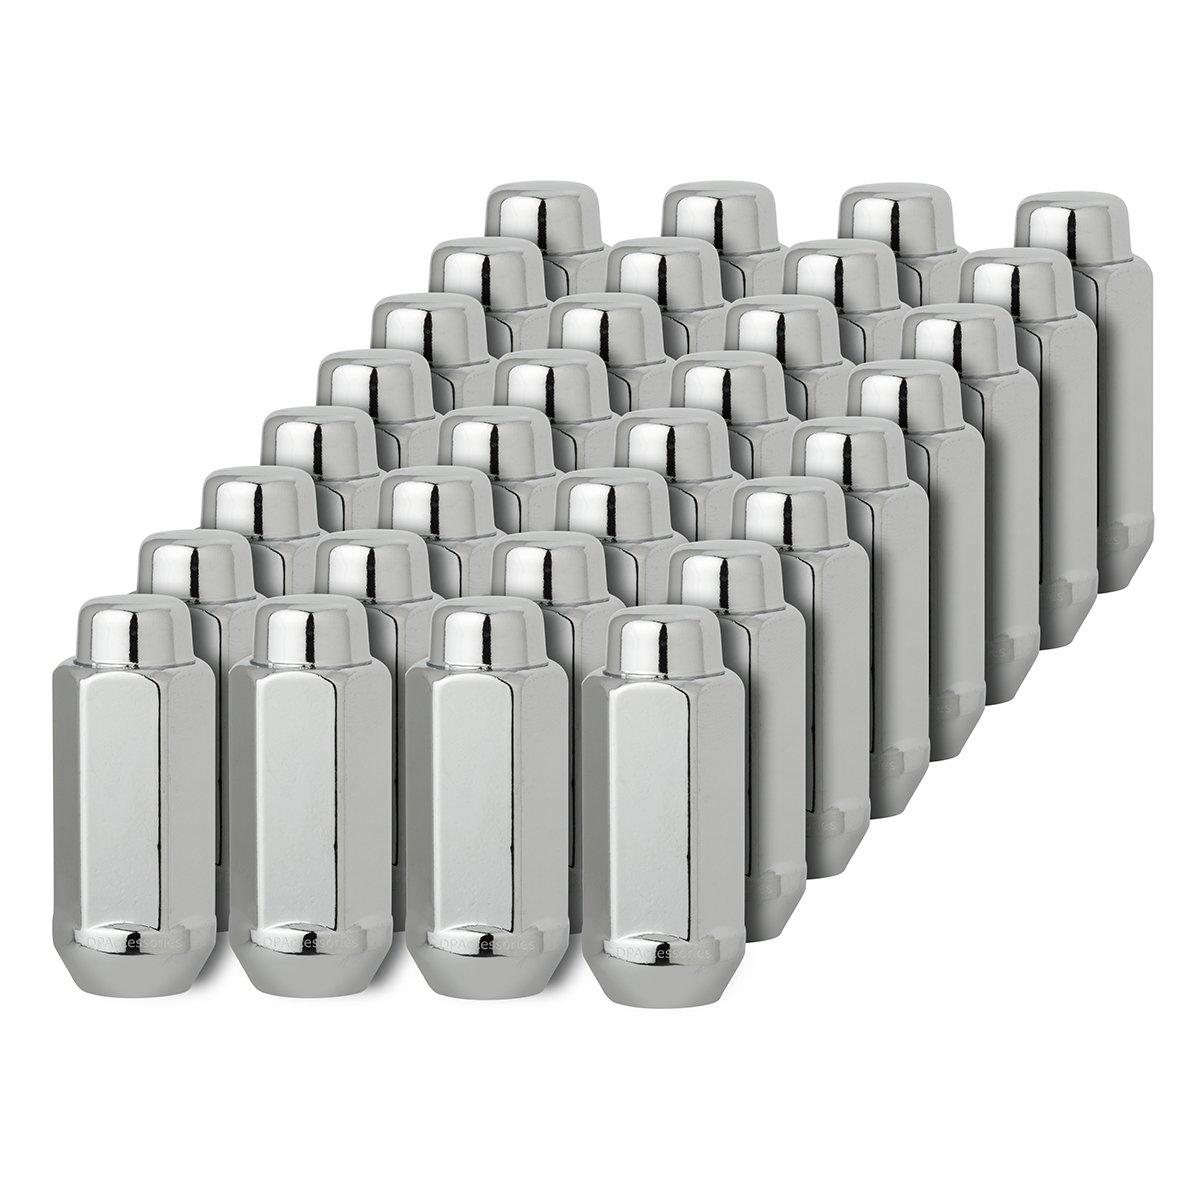 DPAccessories D3618XL-2305/32 32 Chrome 14x1.5 Closed End XXL Bulge Acorn Lug Nuts - Cone Seat - 22mm Hex Wheel Lug Nut